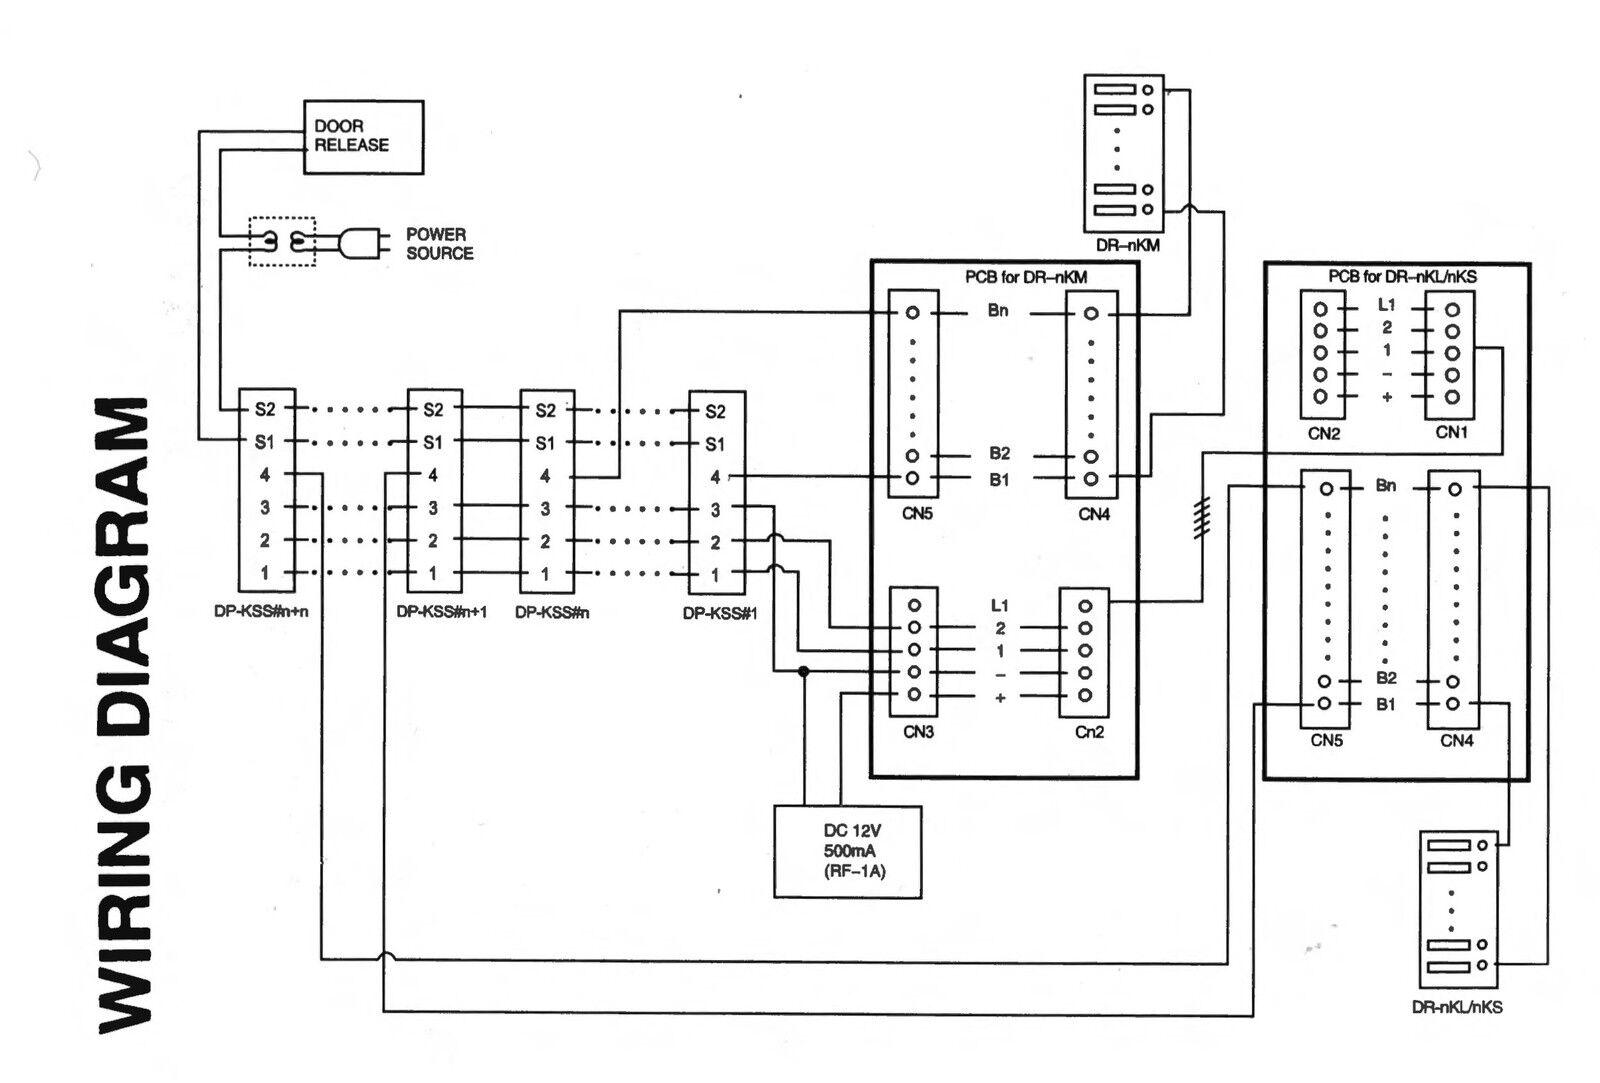 Nett Schaltplan Nutone Cv 450 Galerie - Elektrische Schaltplan-Ideen ...